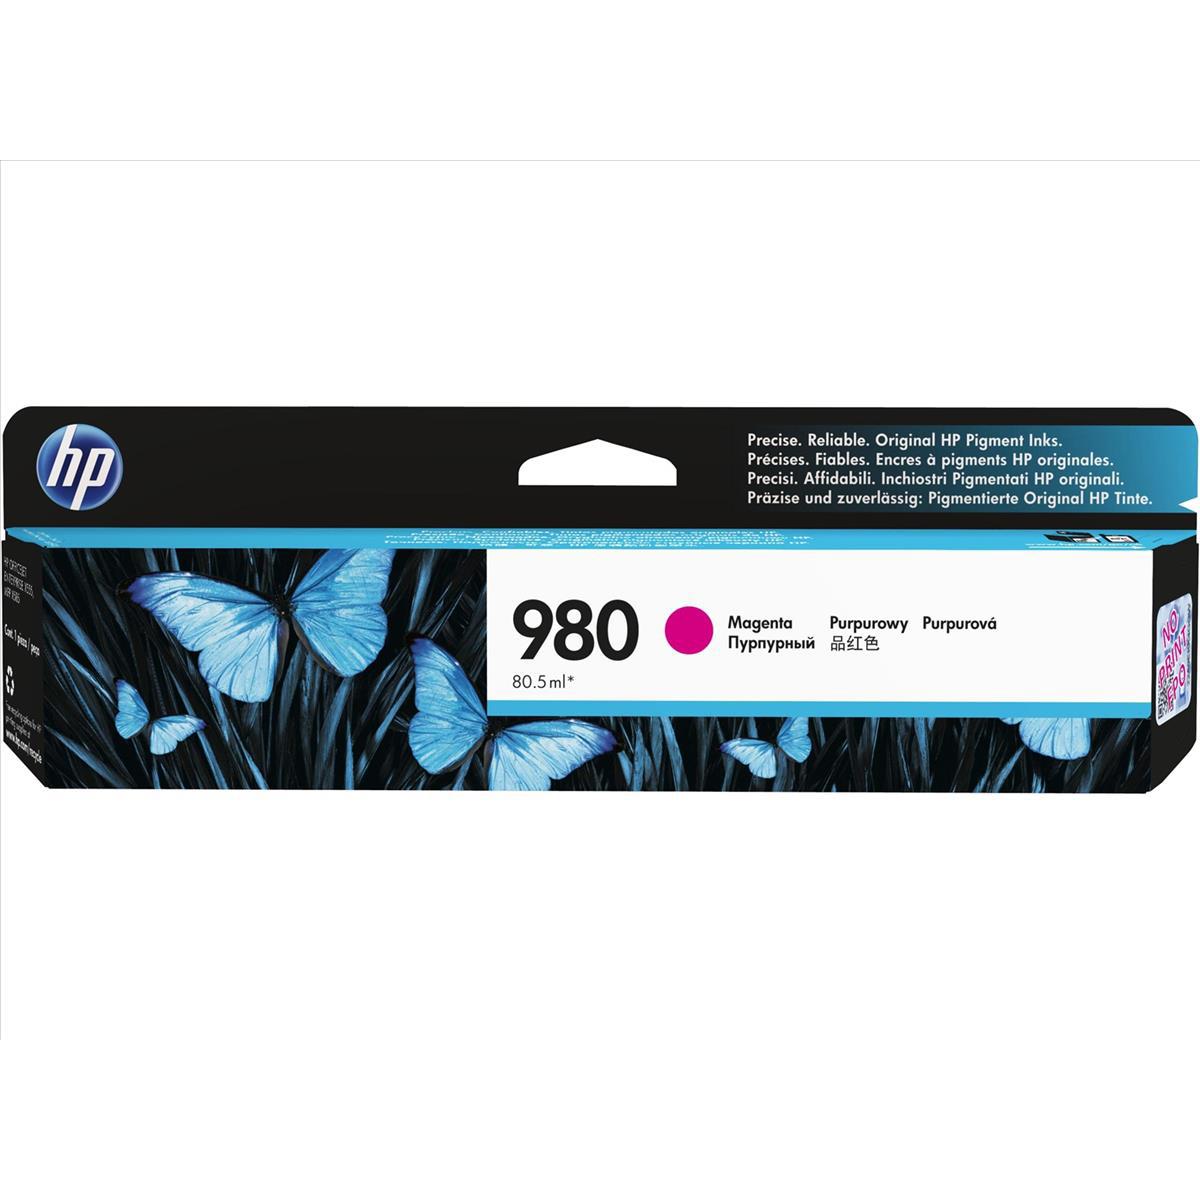 HP 980 Magenta Ink Cartridge D8J08A